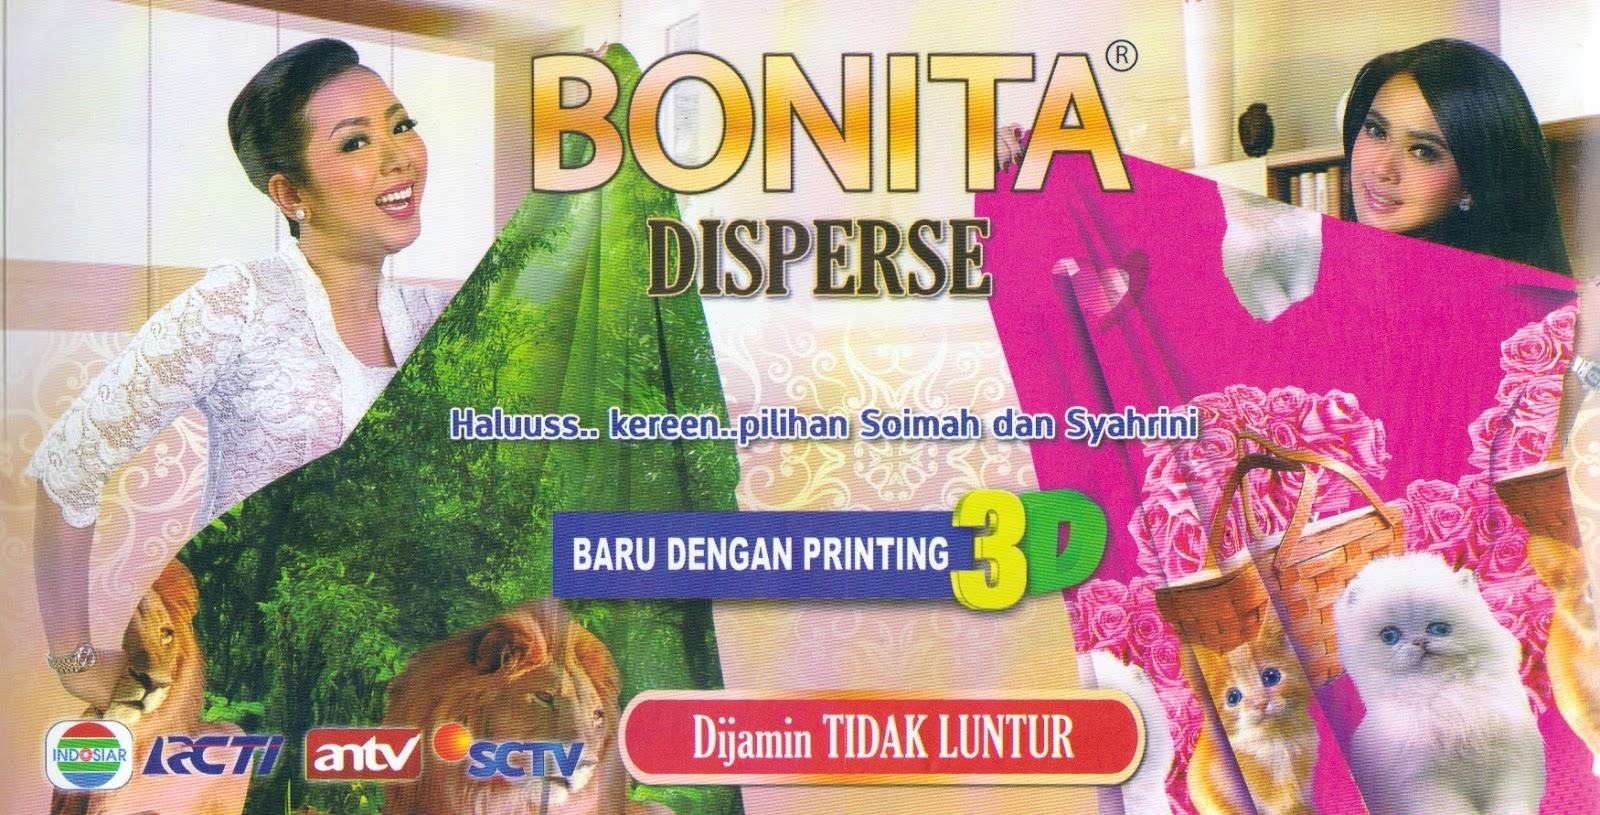 Agen sprei bonita: sprei & bed cover bonita